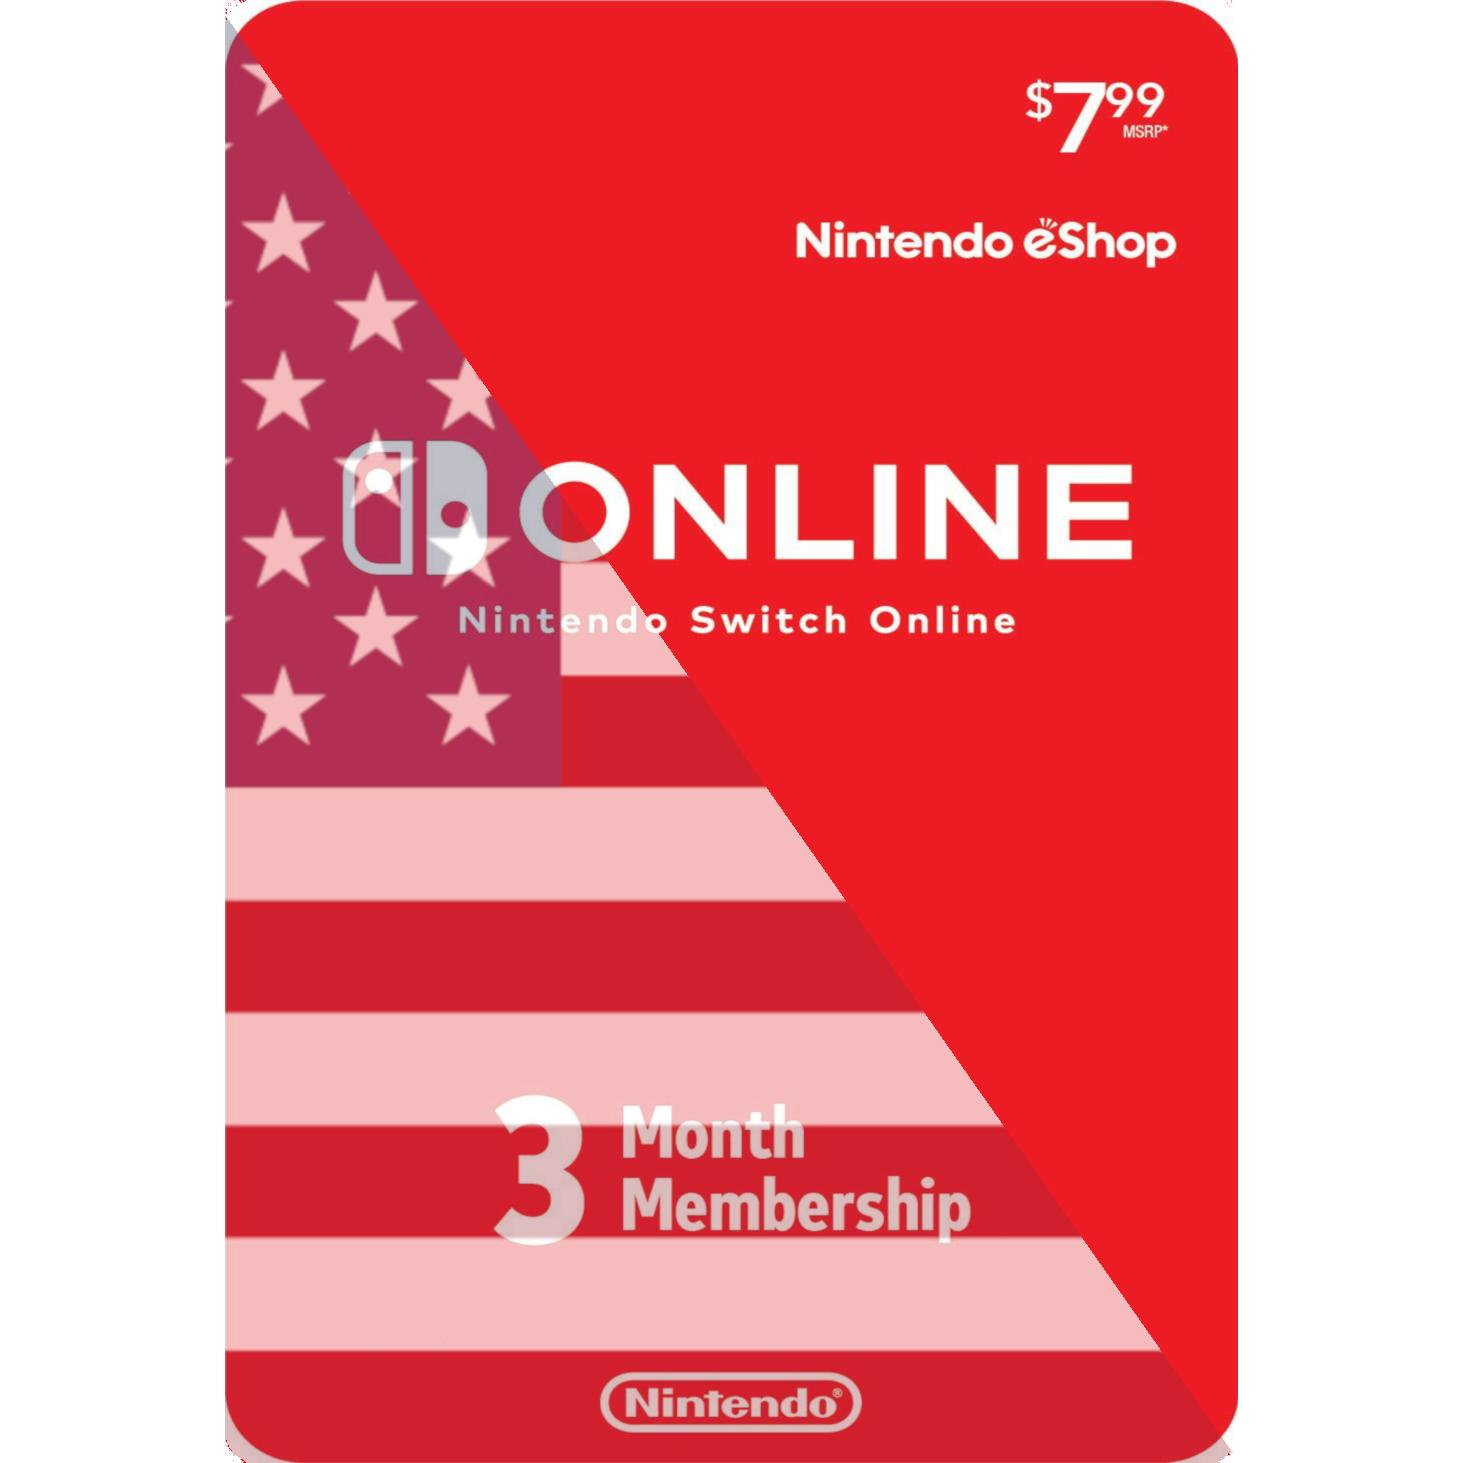 Nintendo Philippines: Nintendo price list - Nintendo Switch